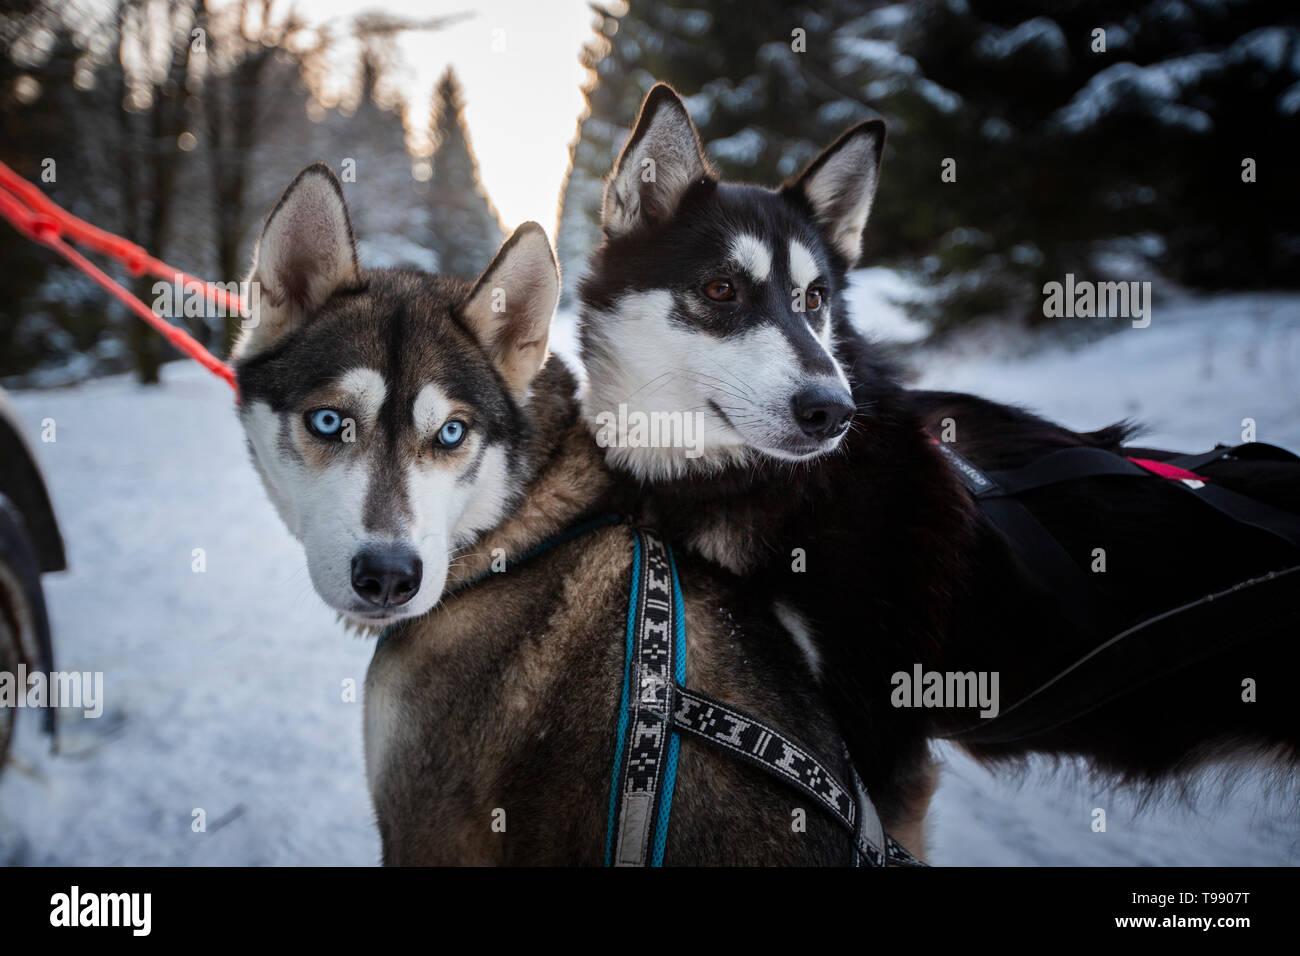 Husky Schlittenhunde tour, Thüringer Wald, Deutschland Stockfoto